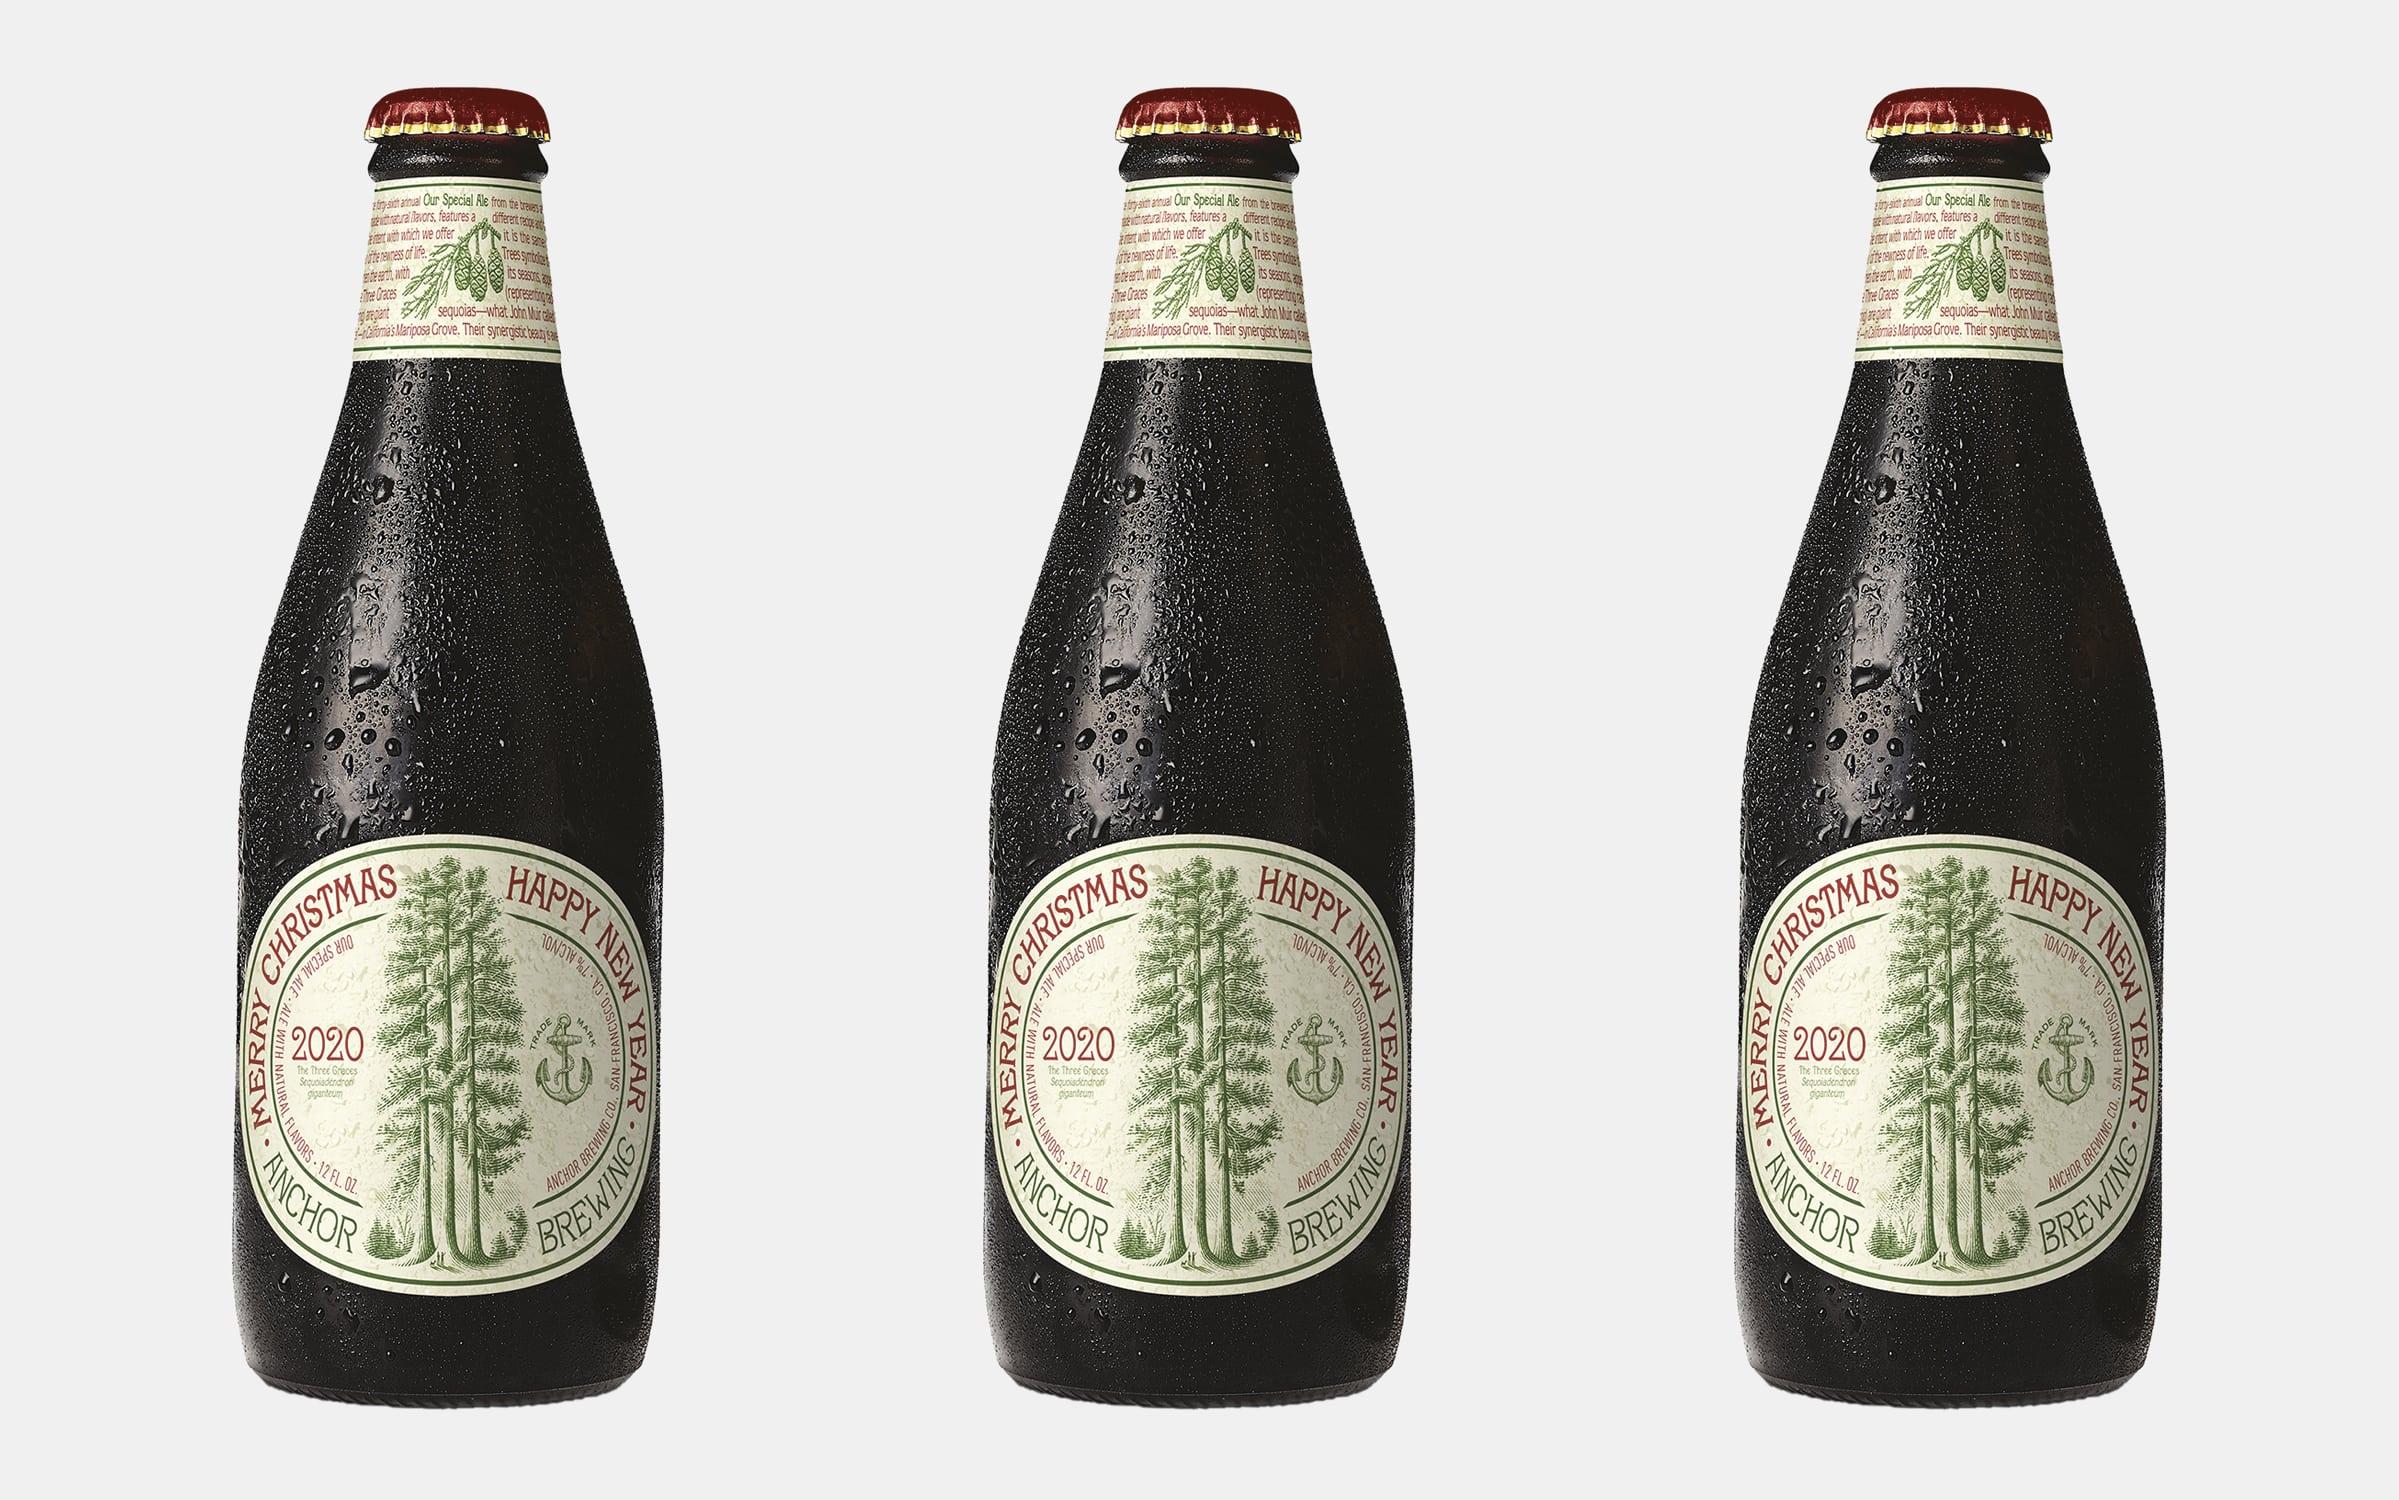 Anchor Brewing 2020 Christmas Ale